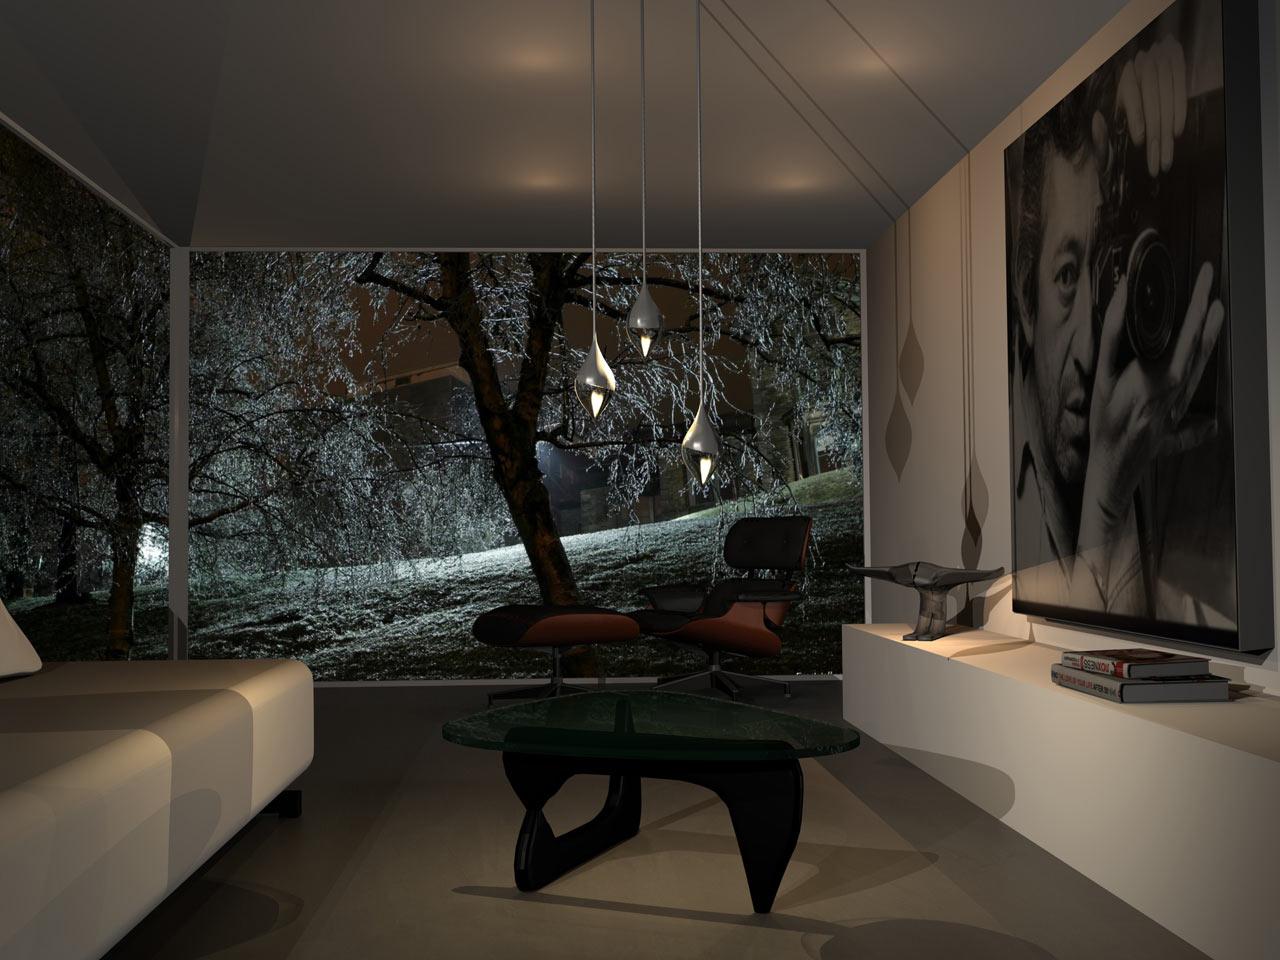 Joeri-Claeys-Stalasso-Light-5-room